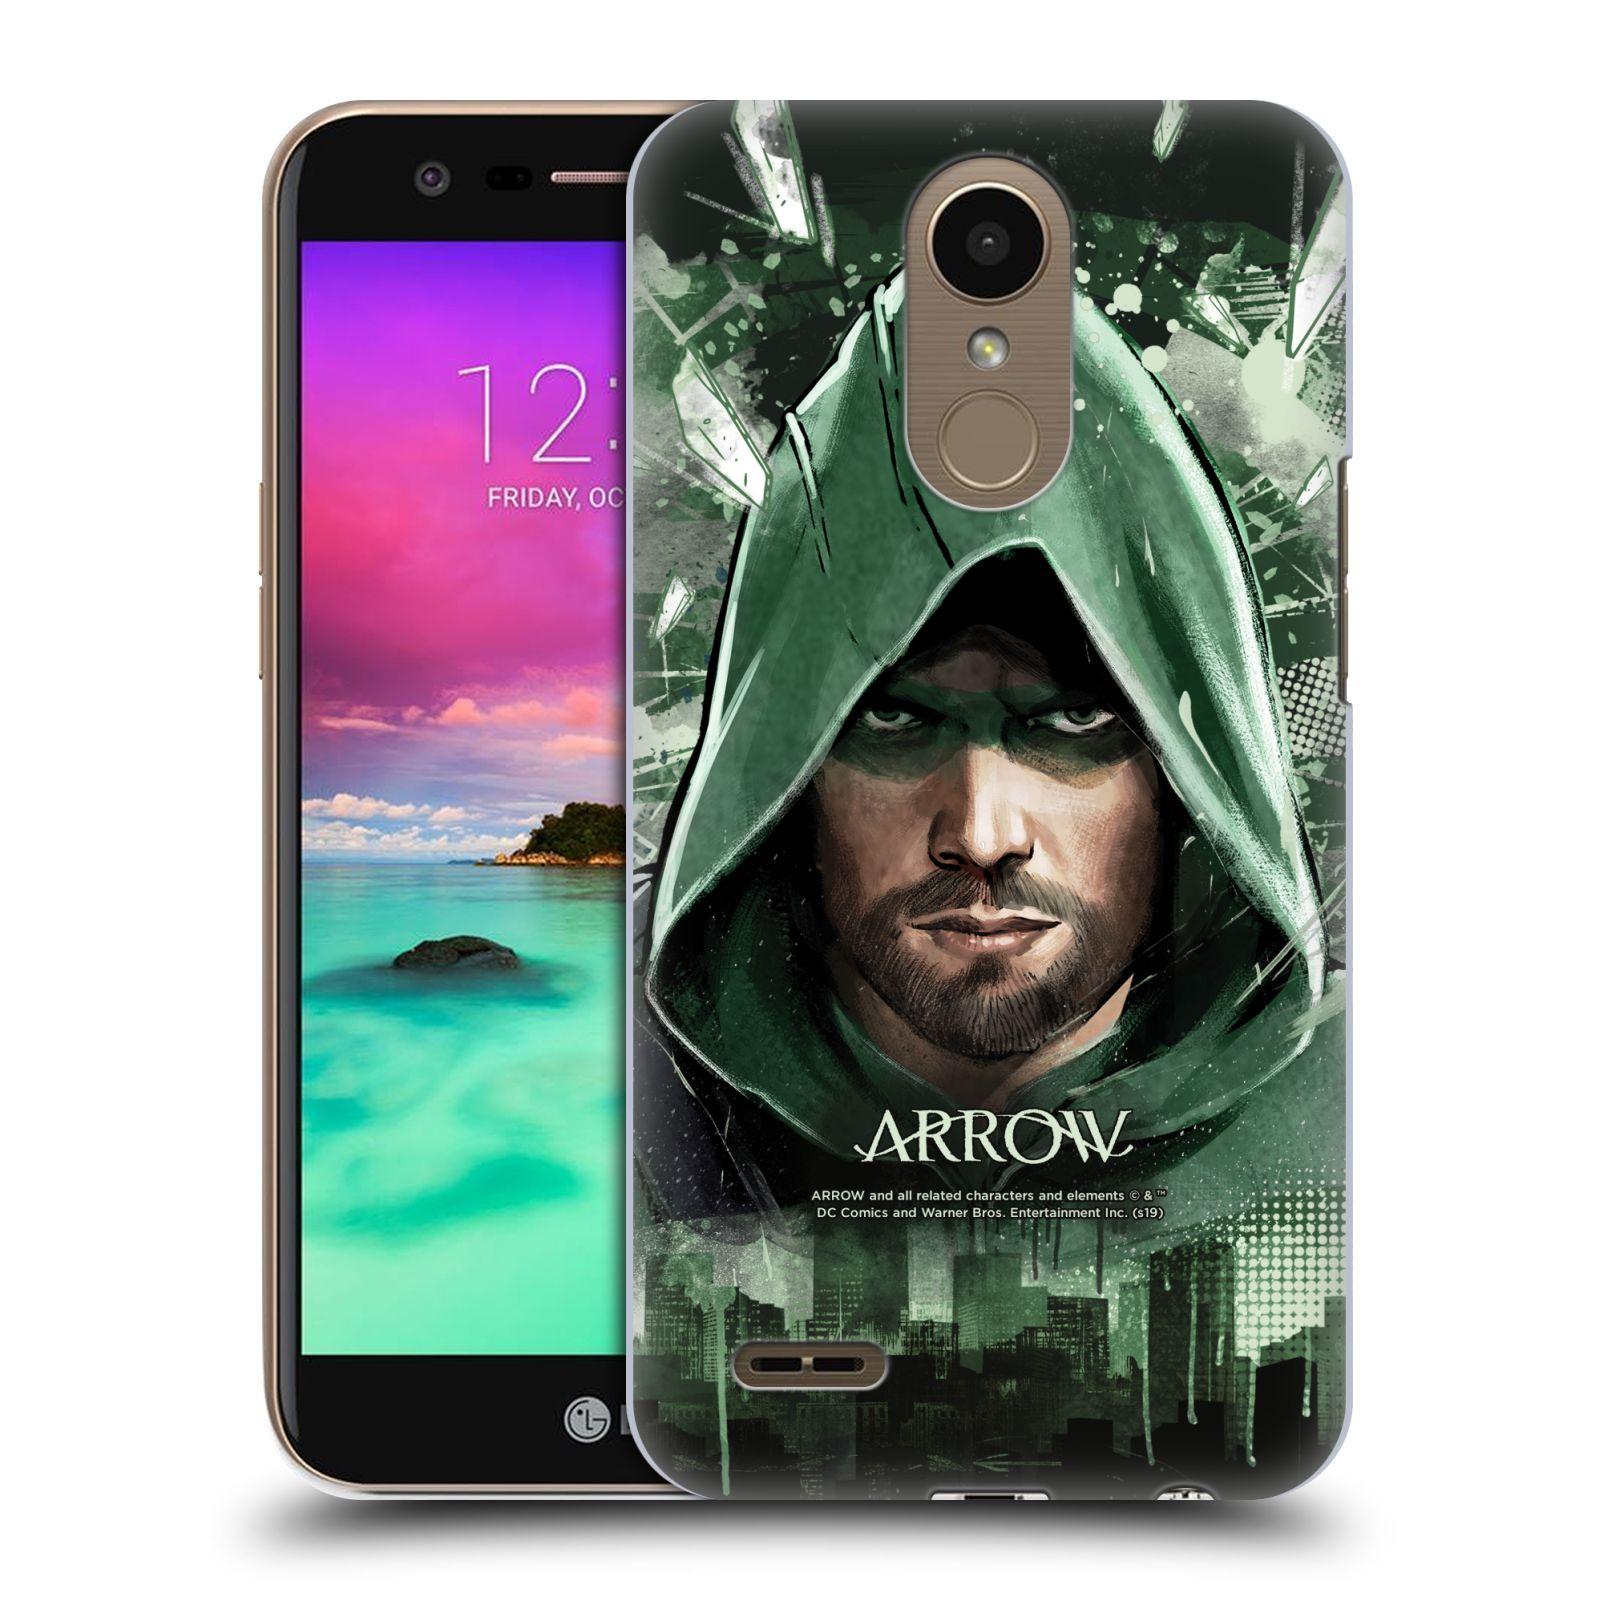 Pouzdro na mobil LG K10 2017 / K10 2017 DUAL SIM - HEAD CASE - Seriál Arrow - kreslený motiv